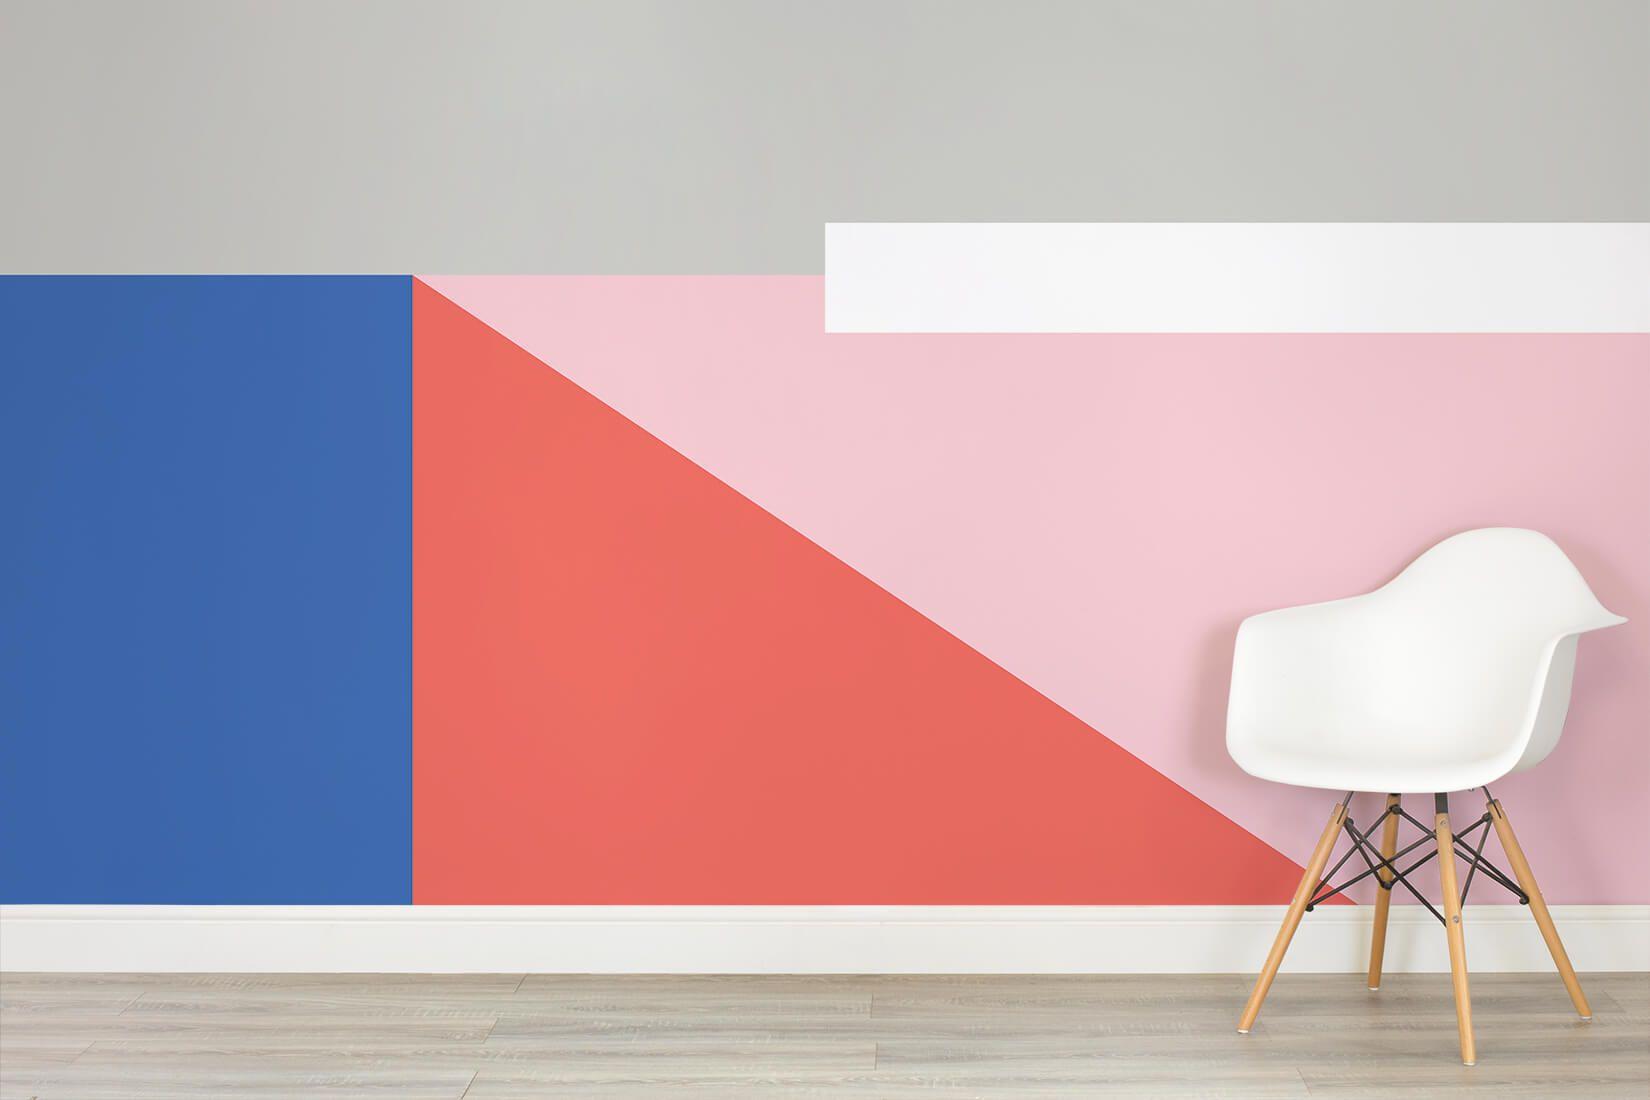 lauinger color block wallpaper mural murals wallpaper in on office wall colors 2021 id=34536